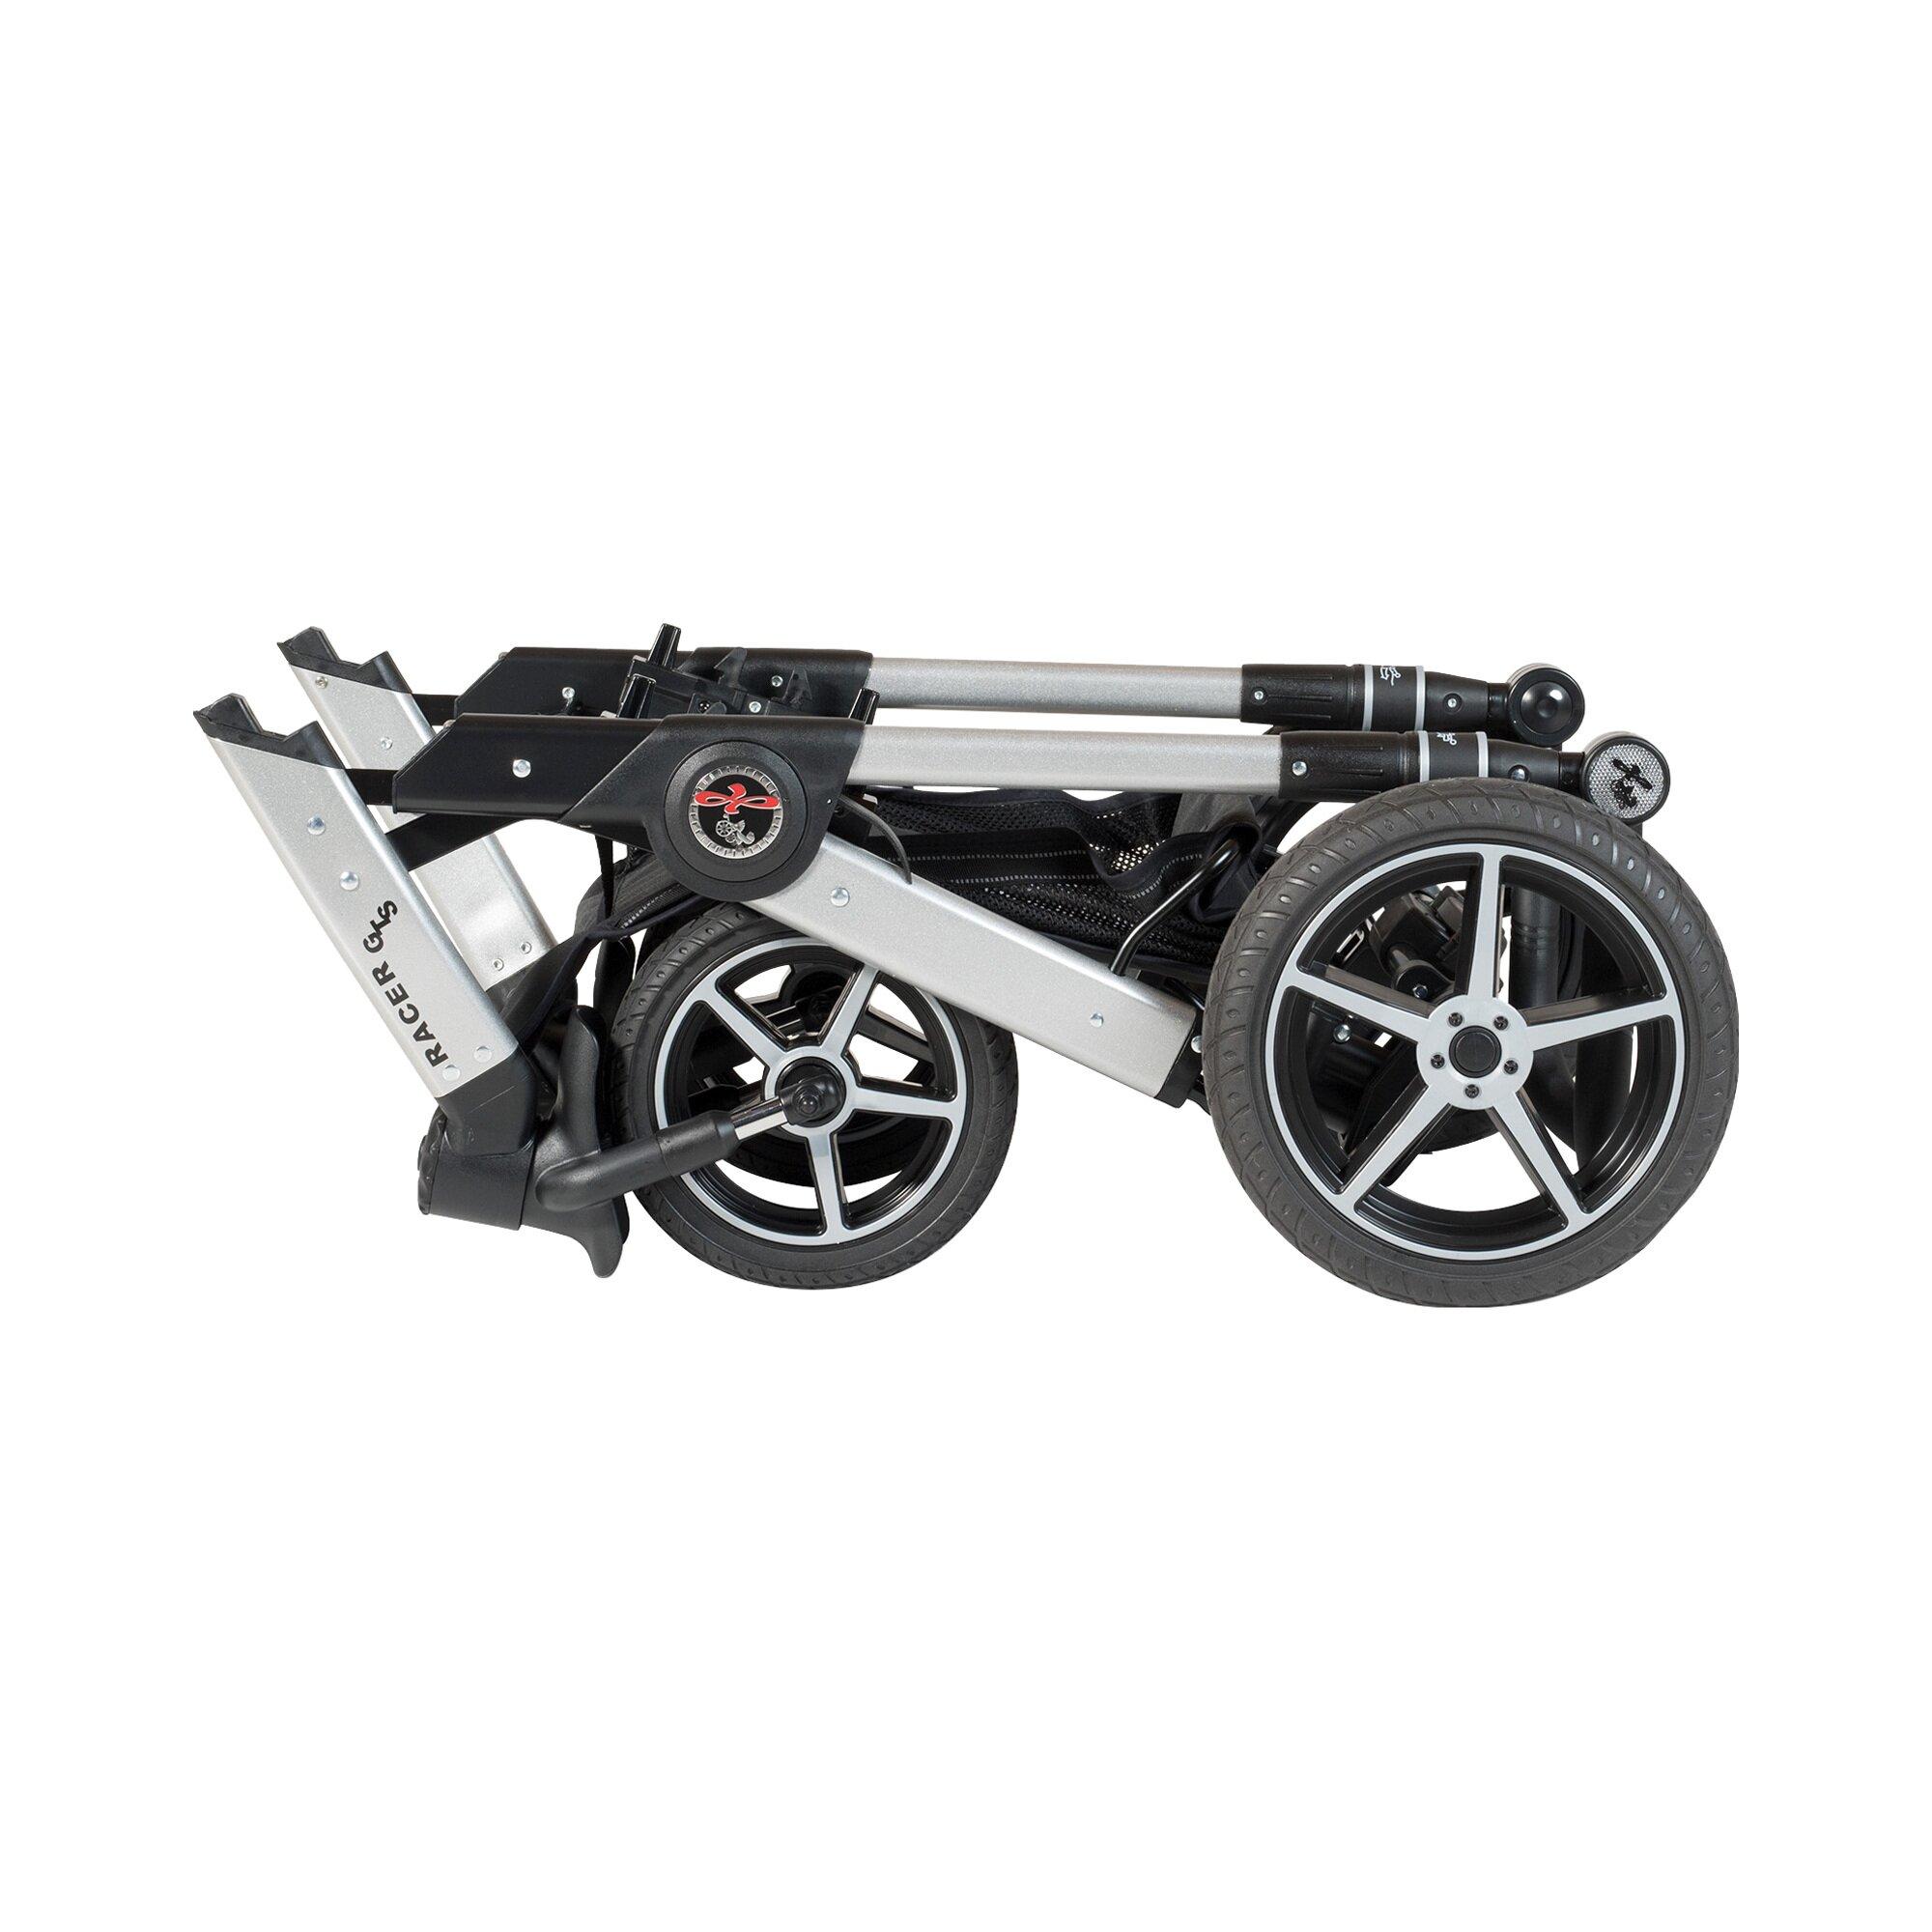 hartan-racer-gts-kinderwagen-design-2018-grau